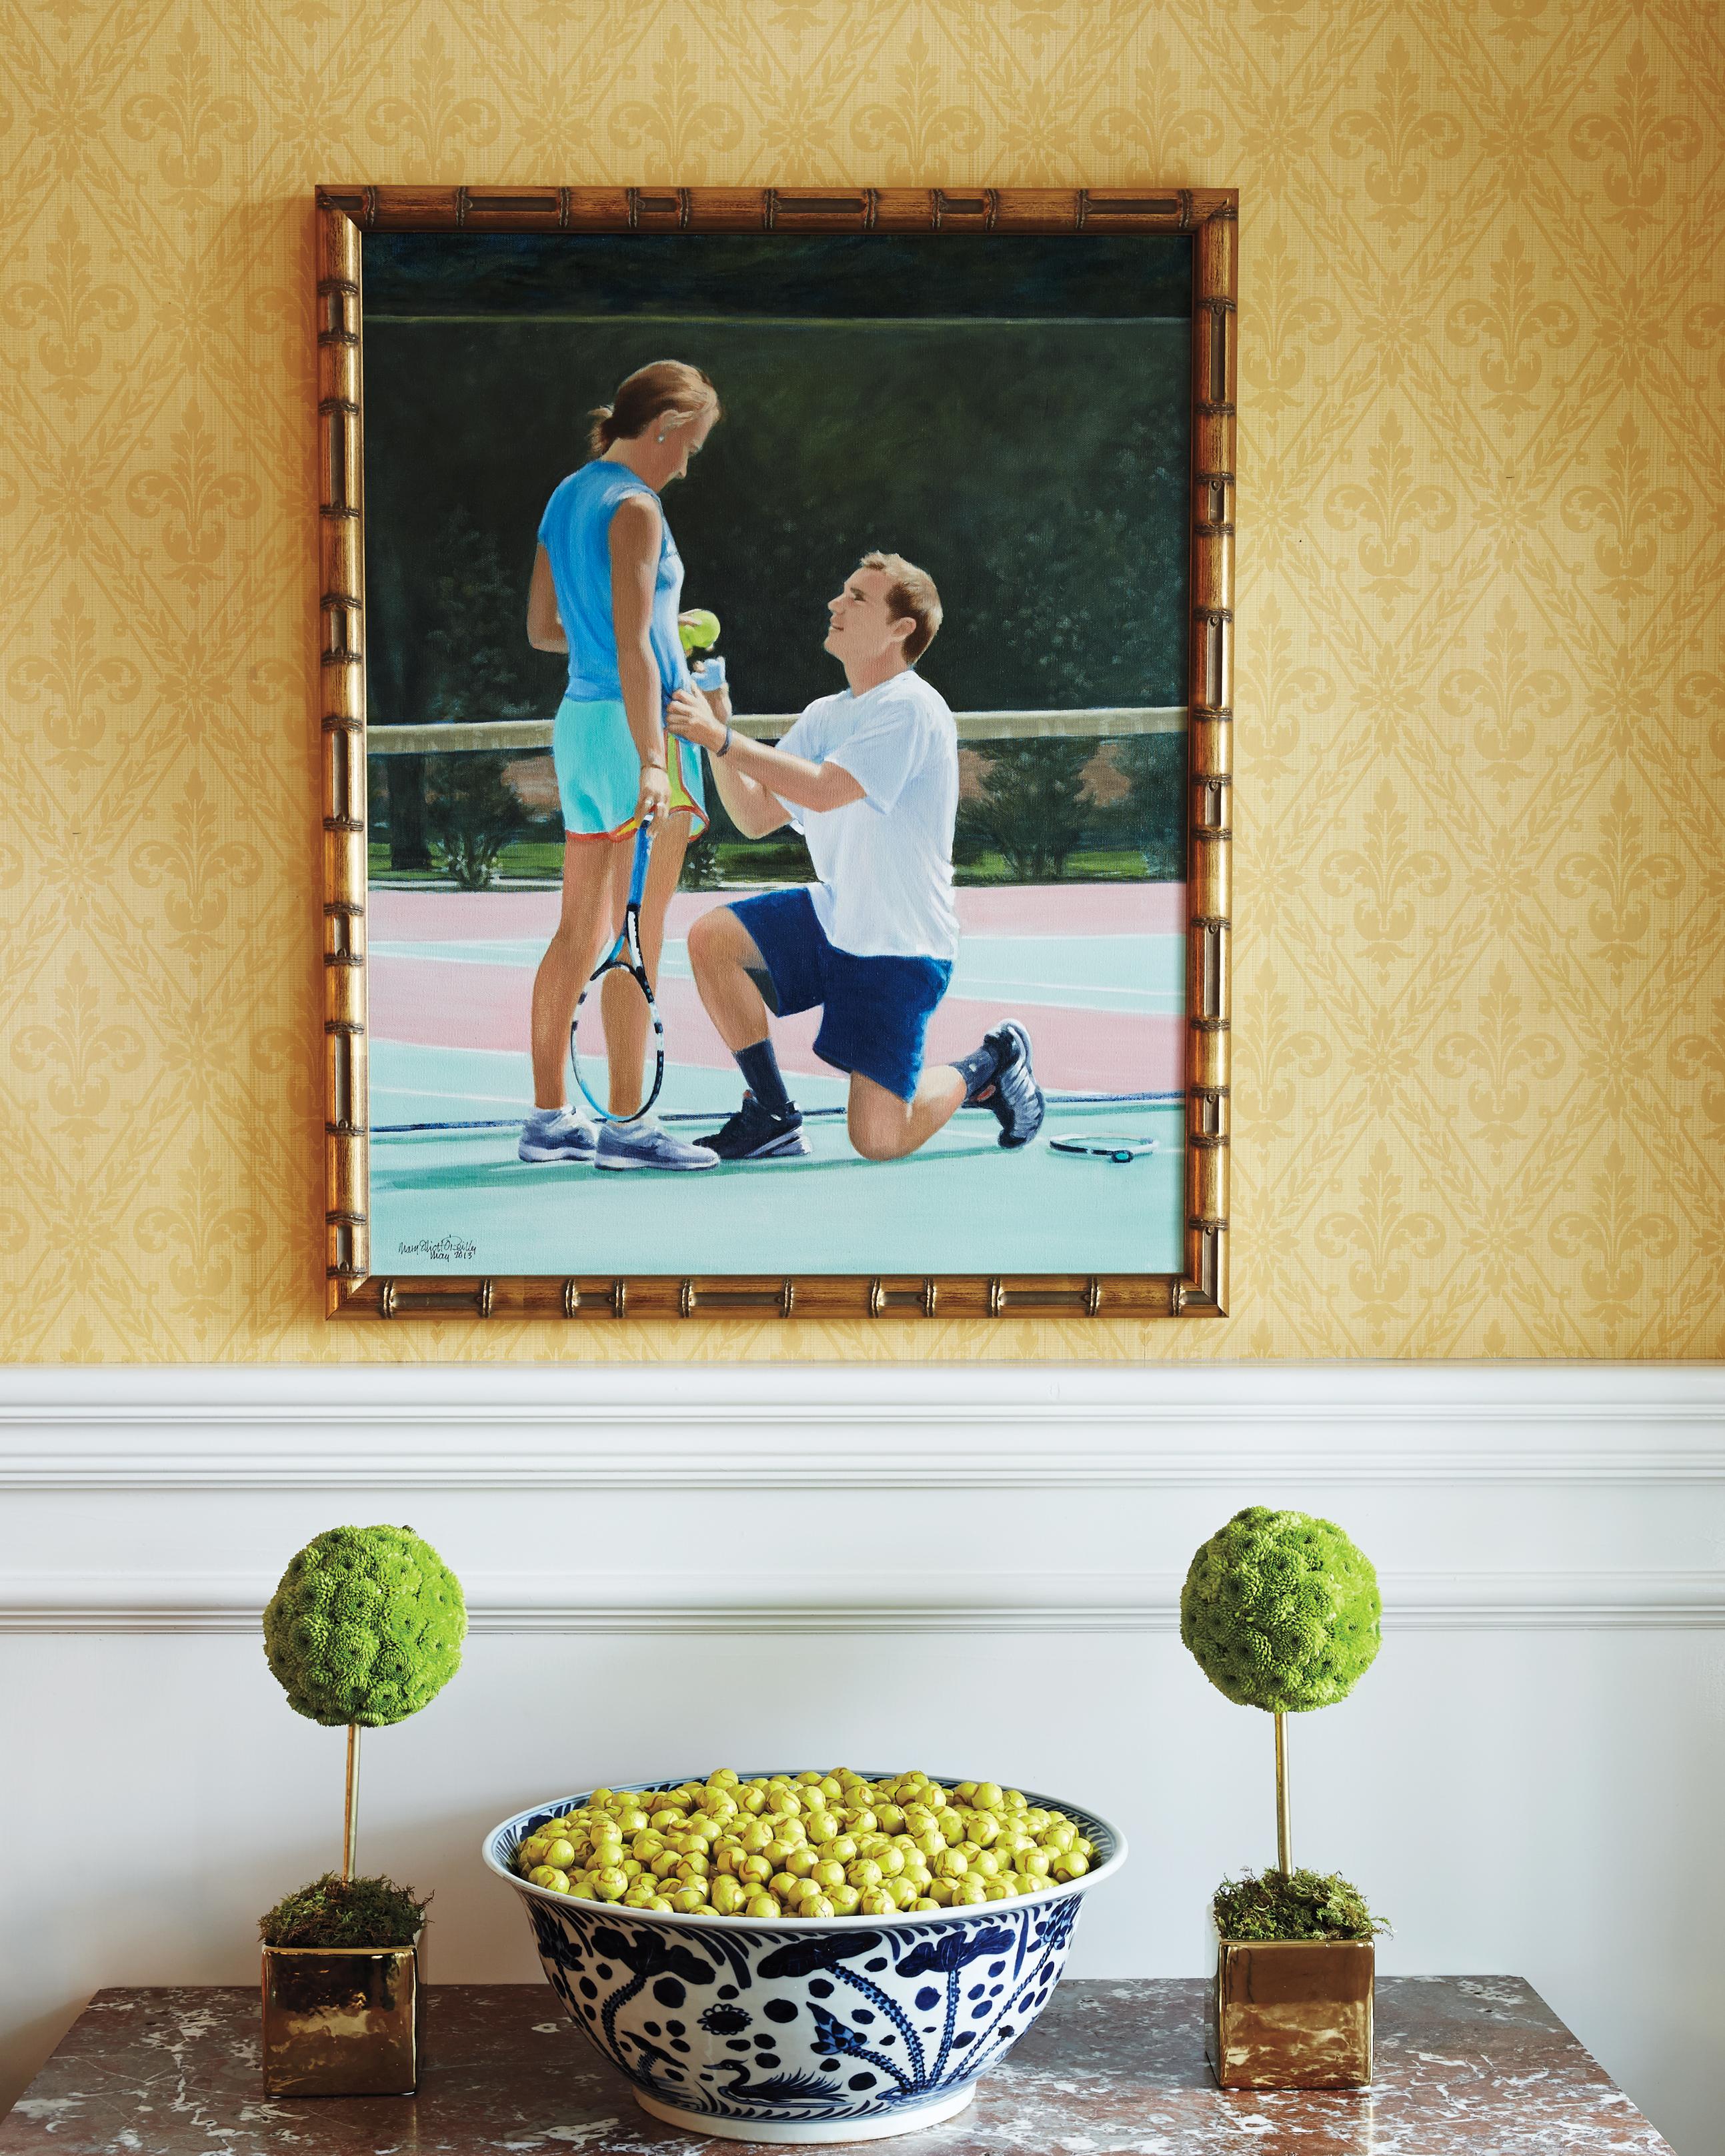 proposal-tennis-court-msw-05-23-13-foyer-4448-md110142.jpg